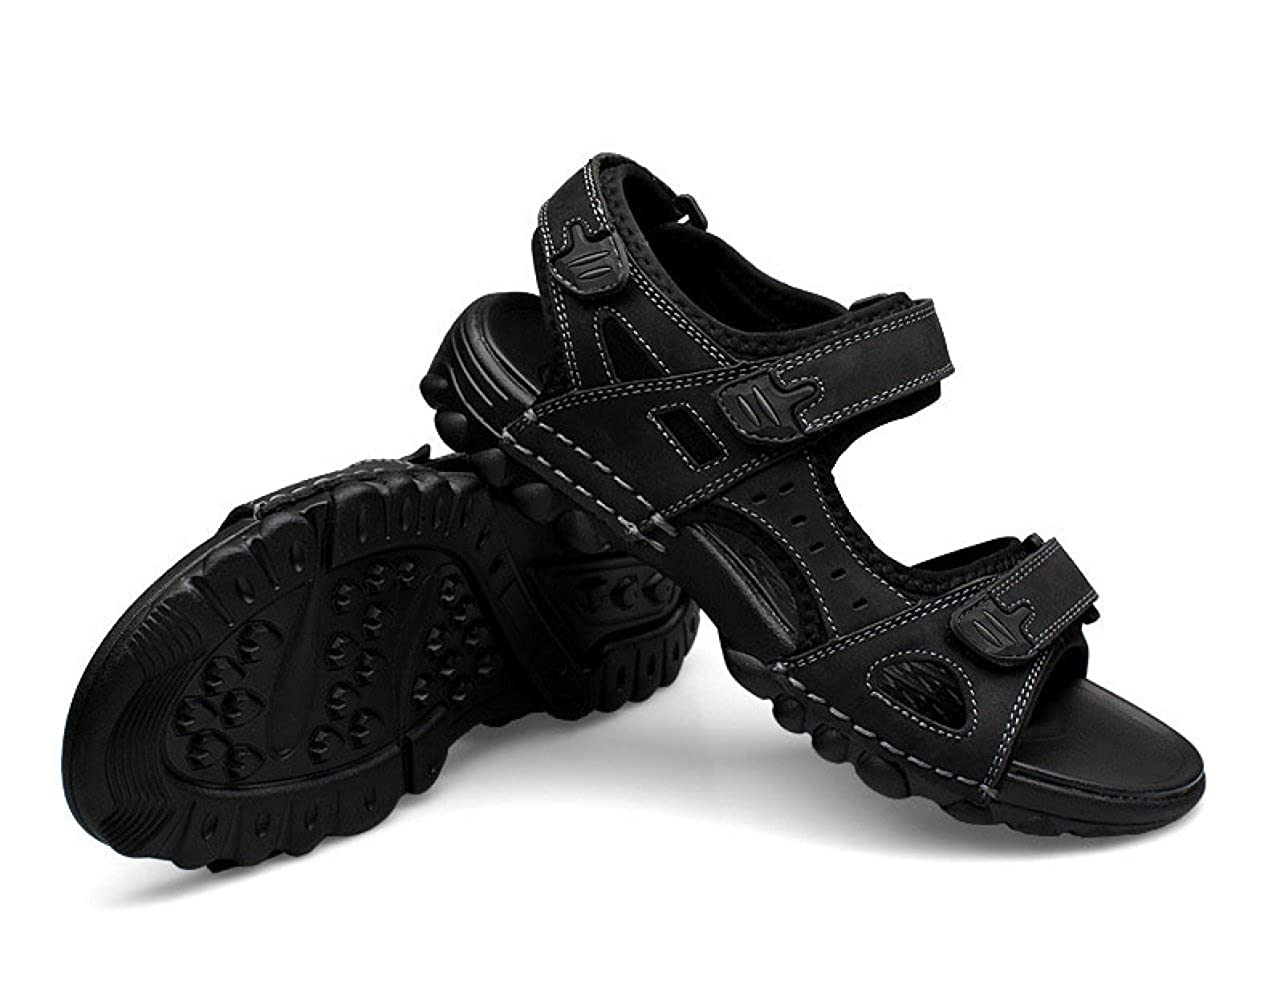 LEDLFIE Herren Sommer Strand Herrenschuhe Schuhe Casual Sandalen Outdoor Herrenschuhe Strand schwarz 87545d